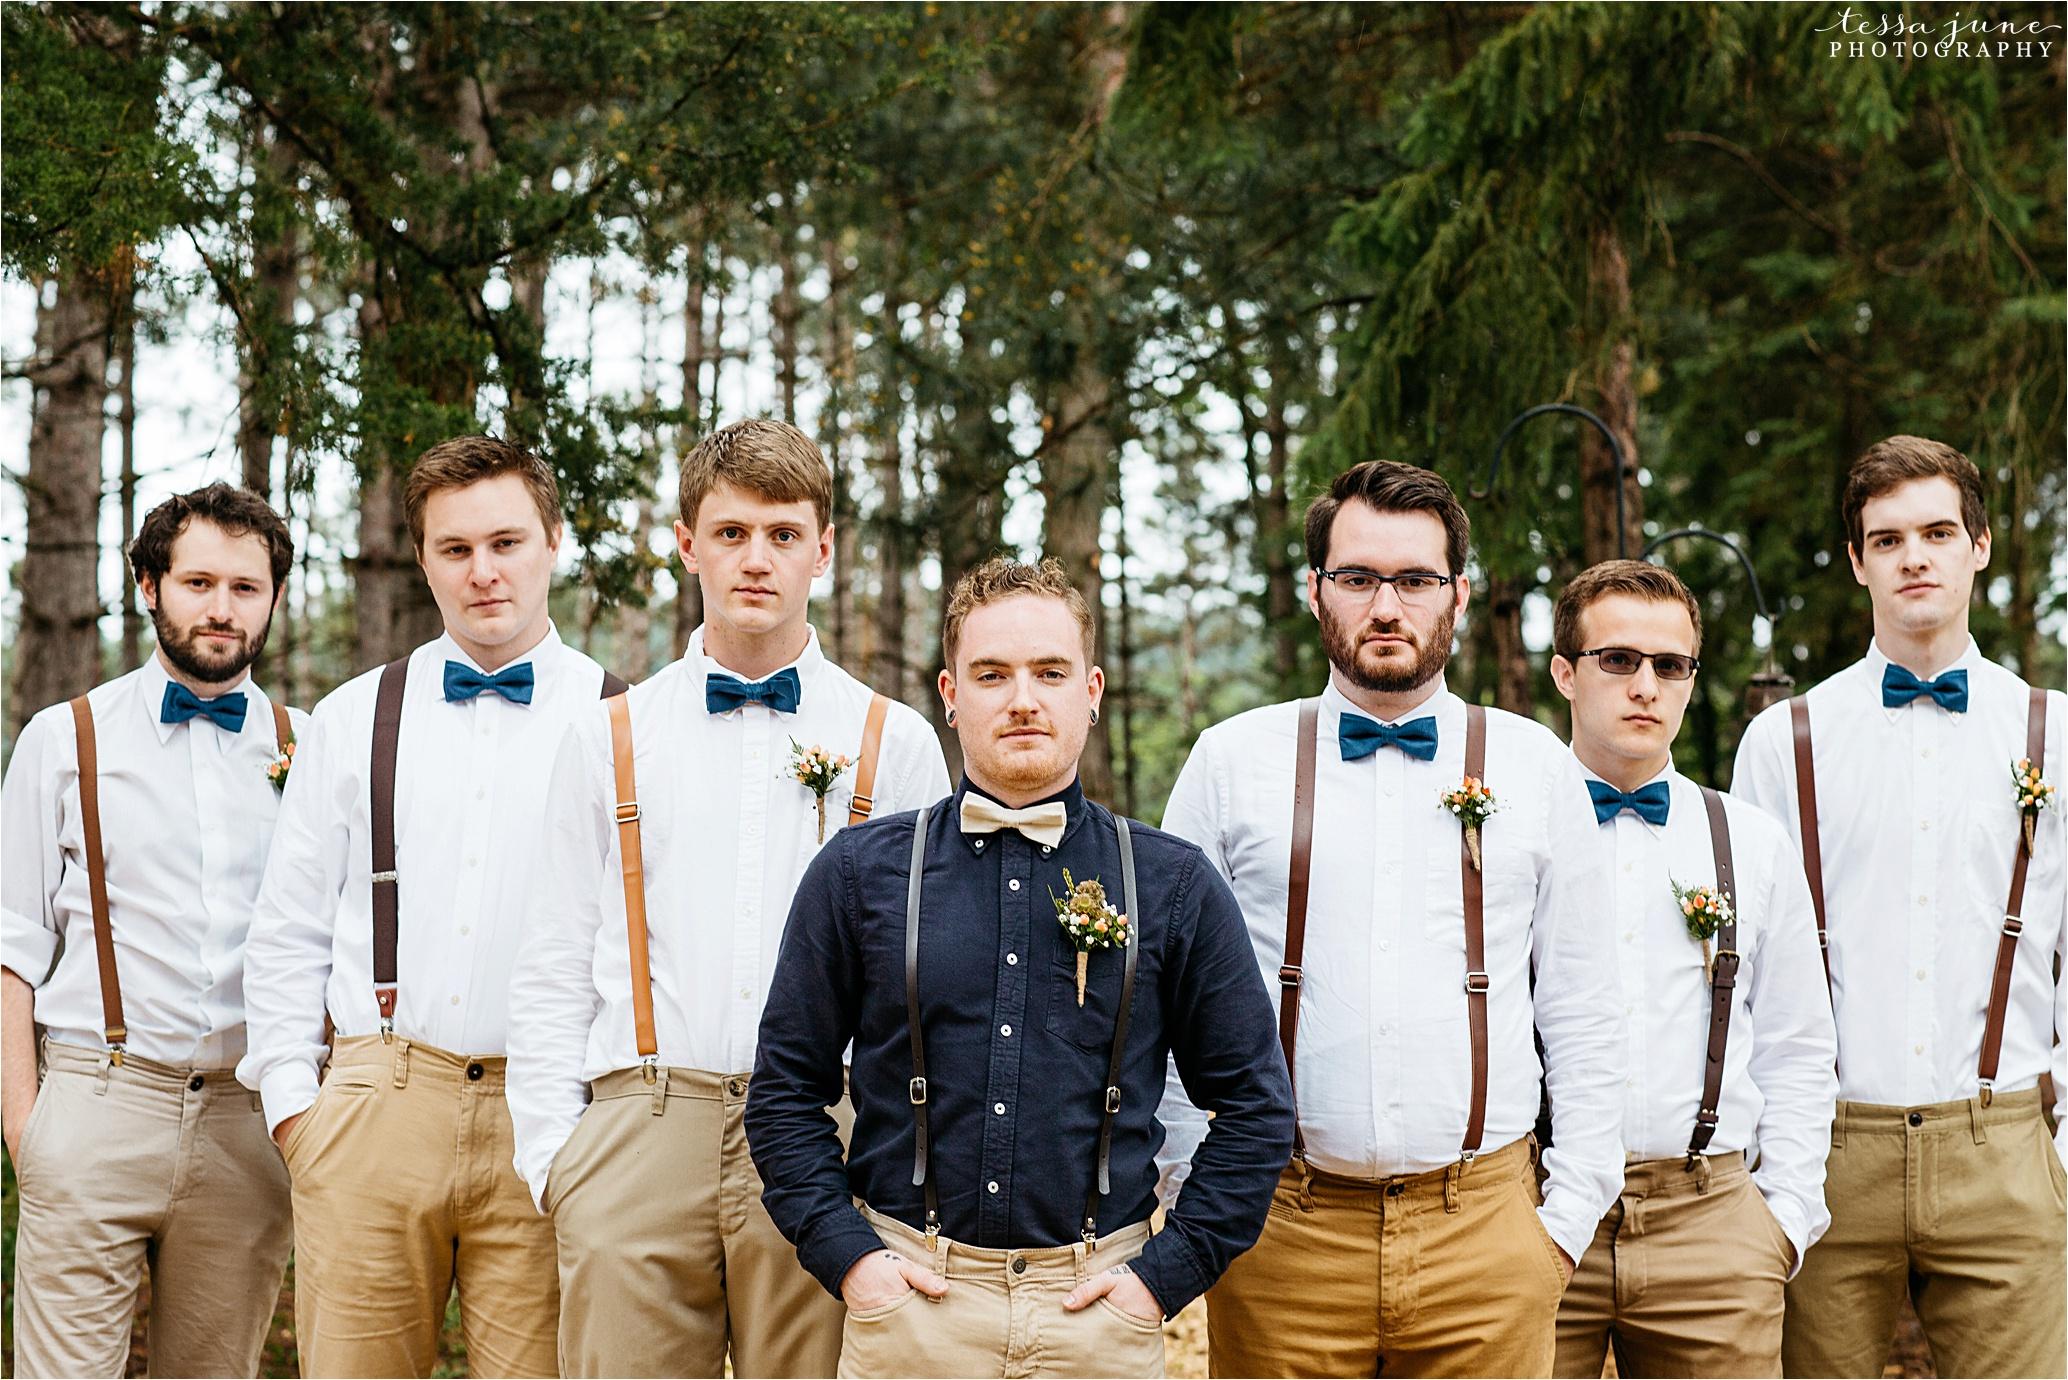 bohemian-forest-wedding-stillwater-minnesota-flower-crown-st-cloud-photographer-groomsmen